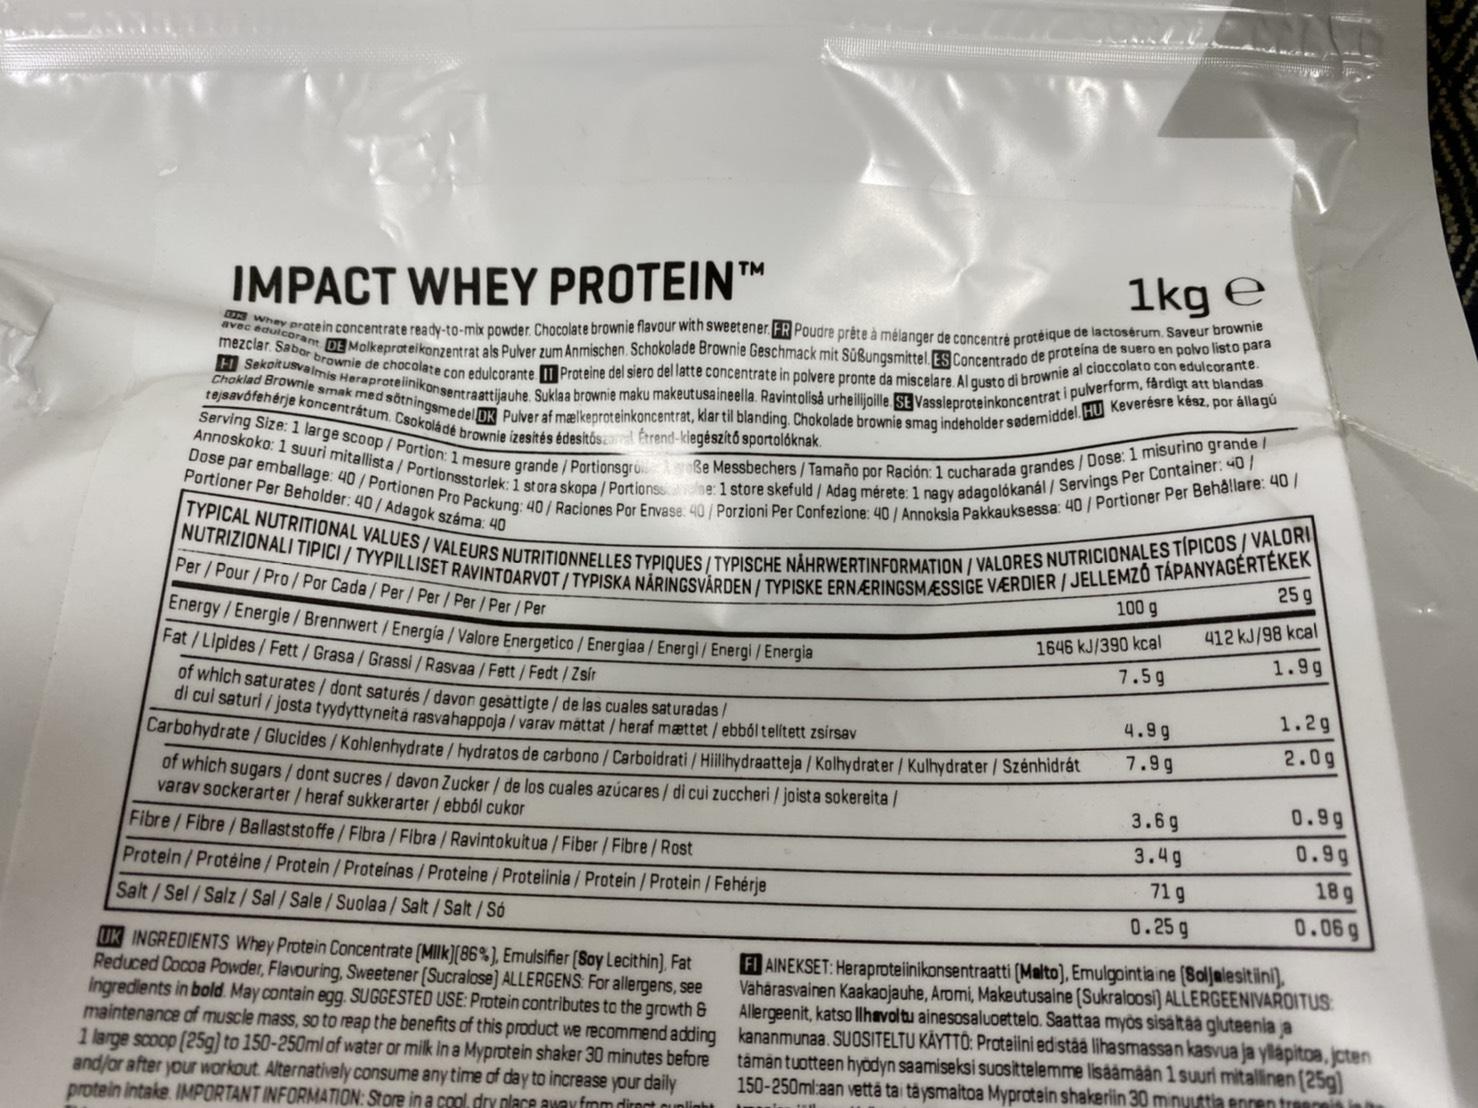 Impactホエイプロテイン:チョコレートブラウニー味の成分表